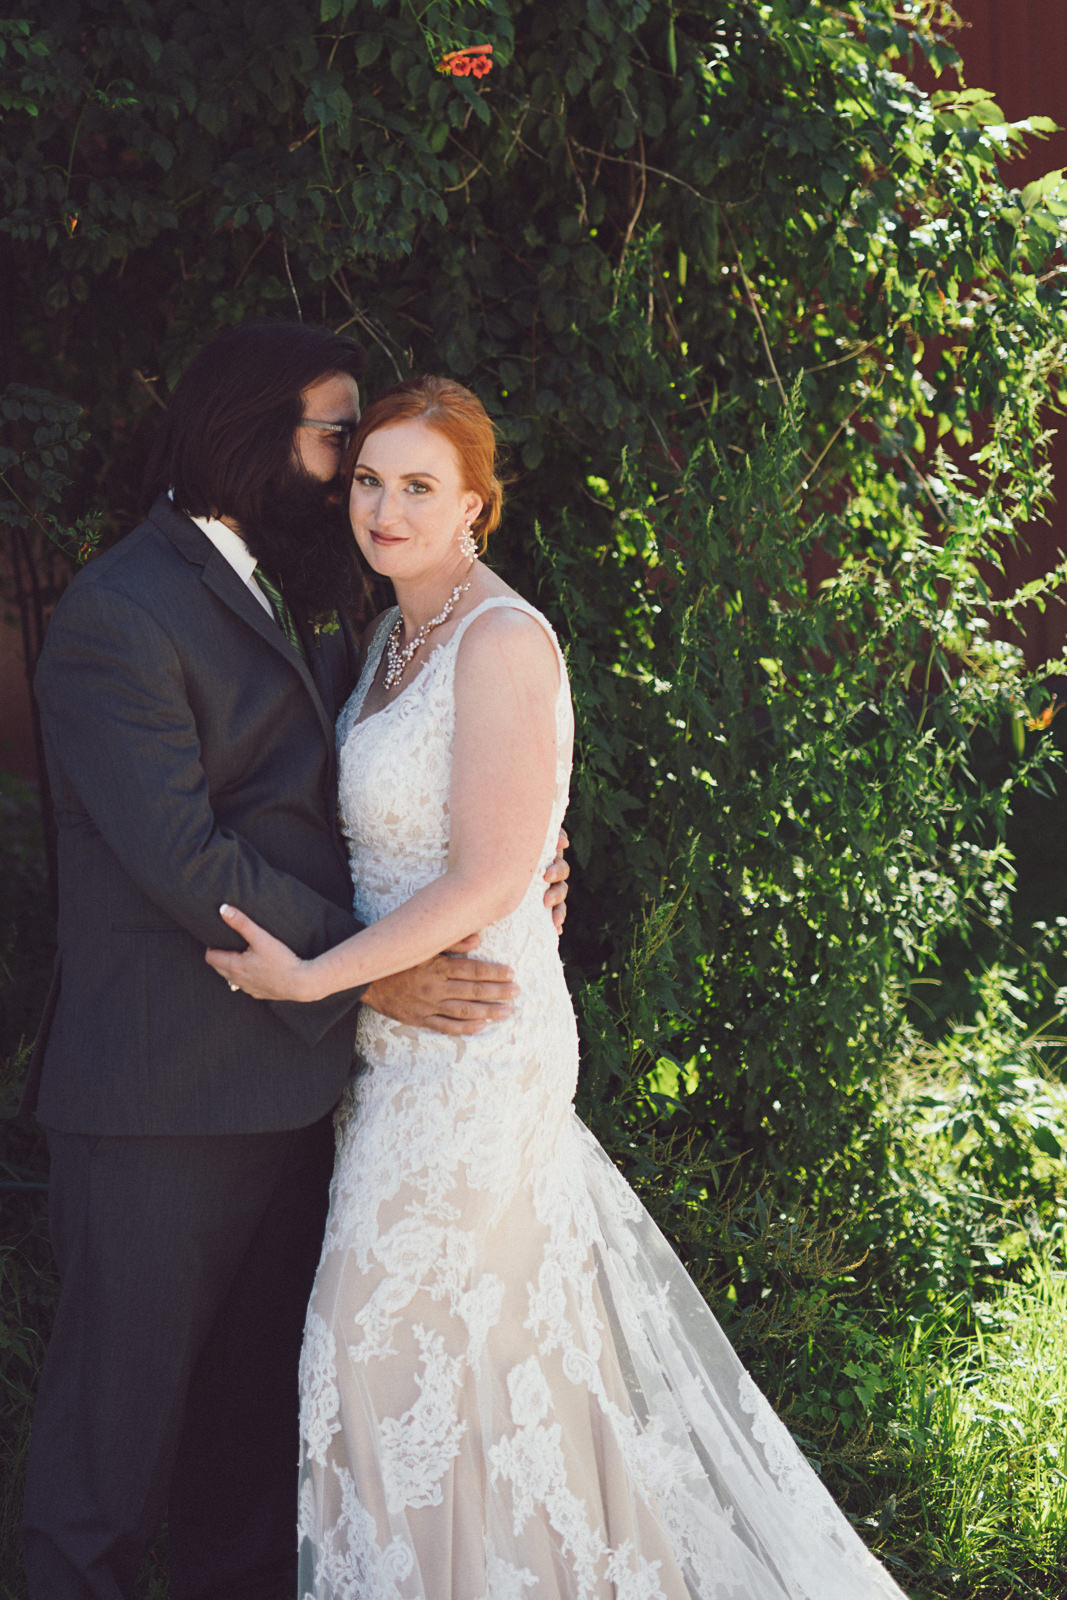 wedding-keely-caleb-459-name-your-photo.jpg